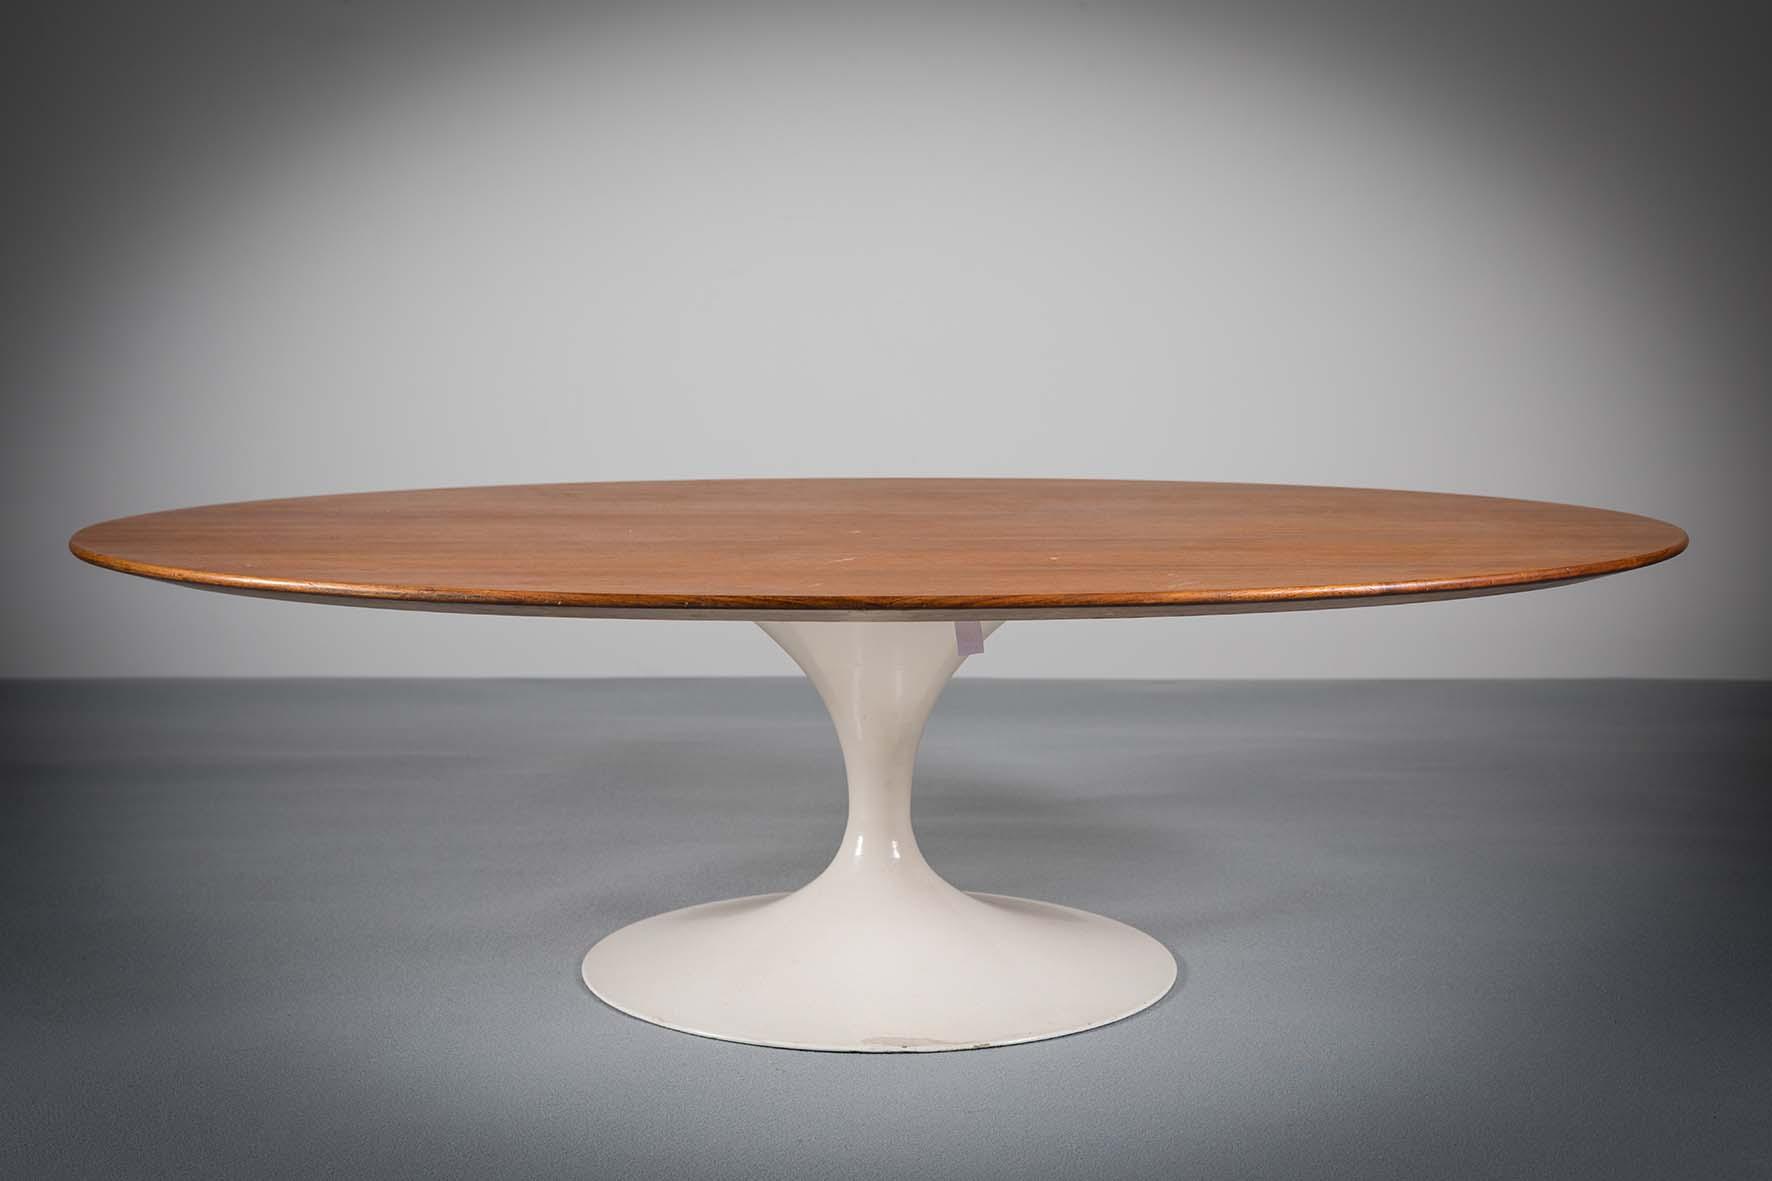 Lot 6 - TULIP TABLE by Eero Saarinen